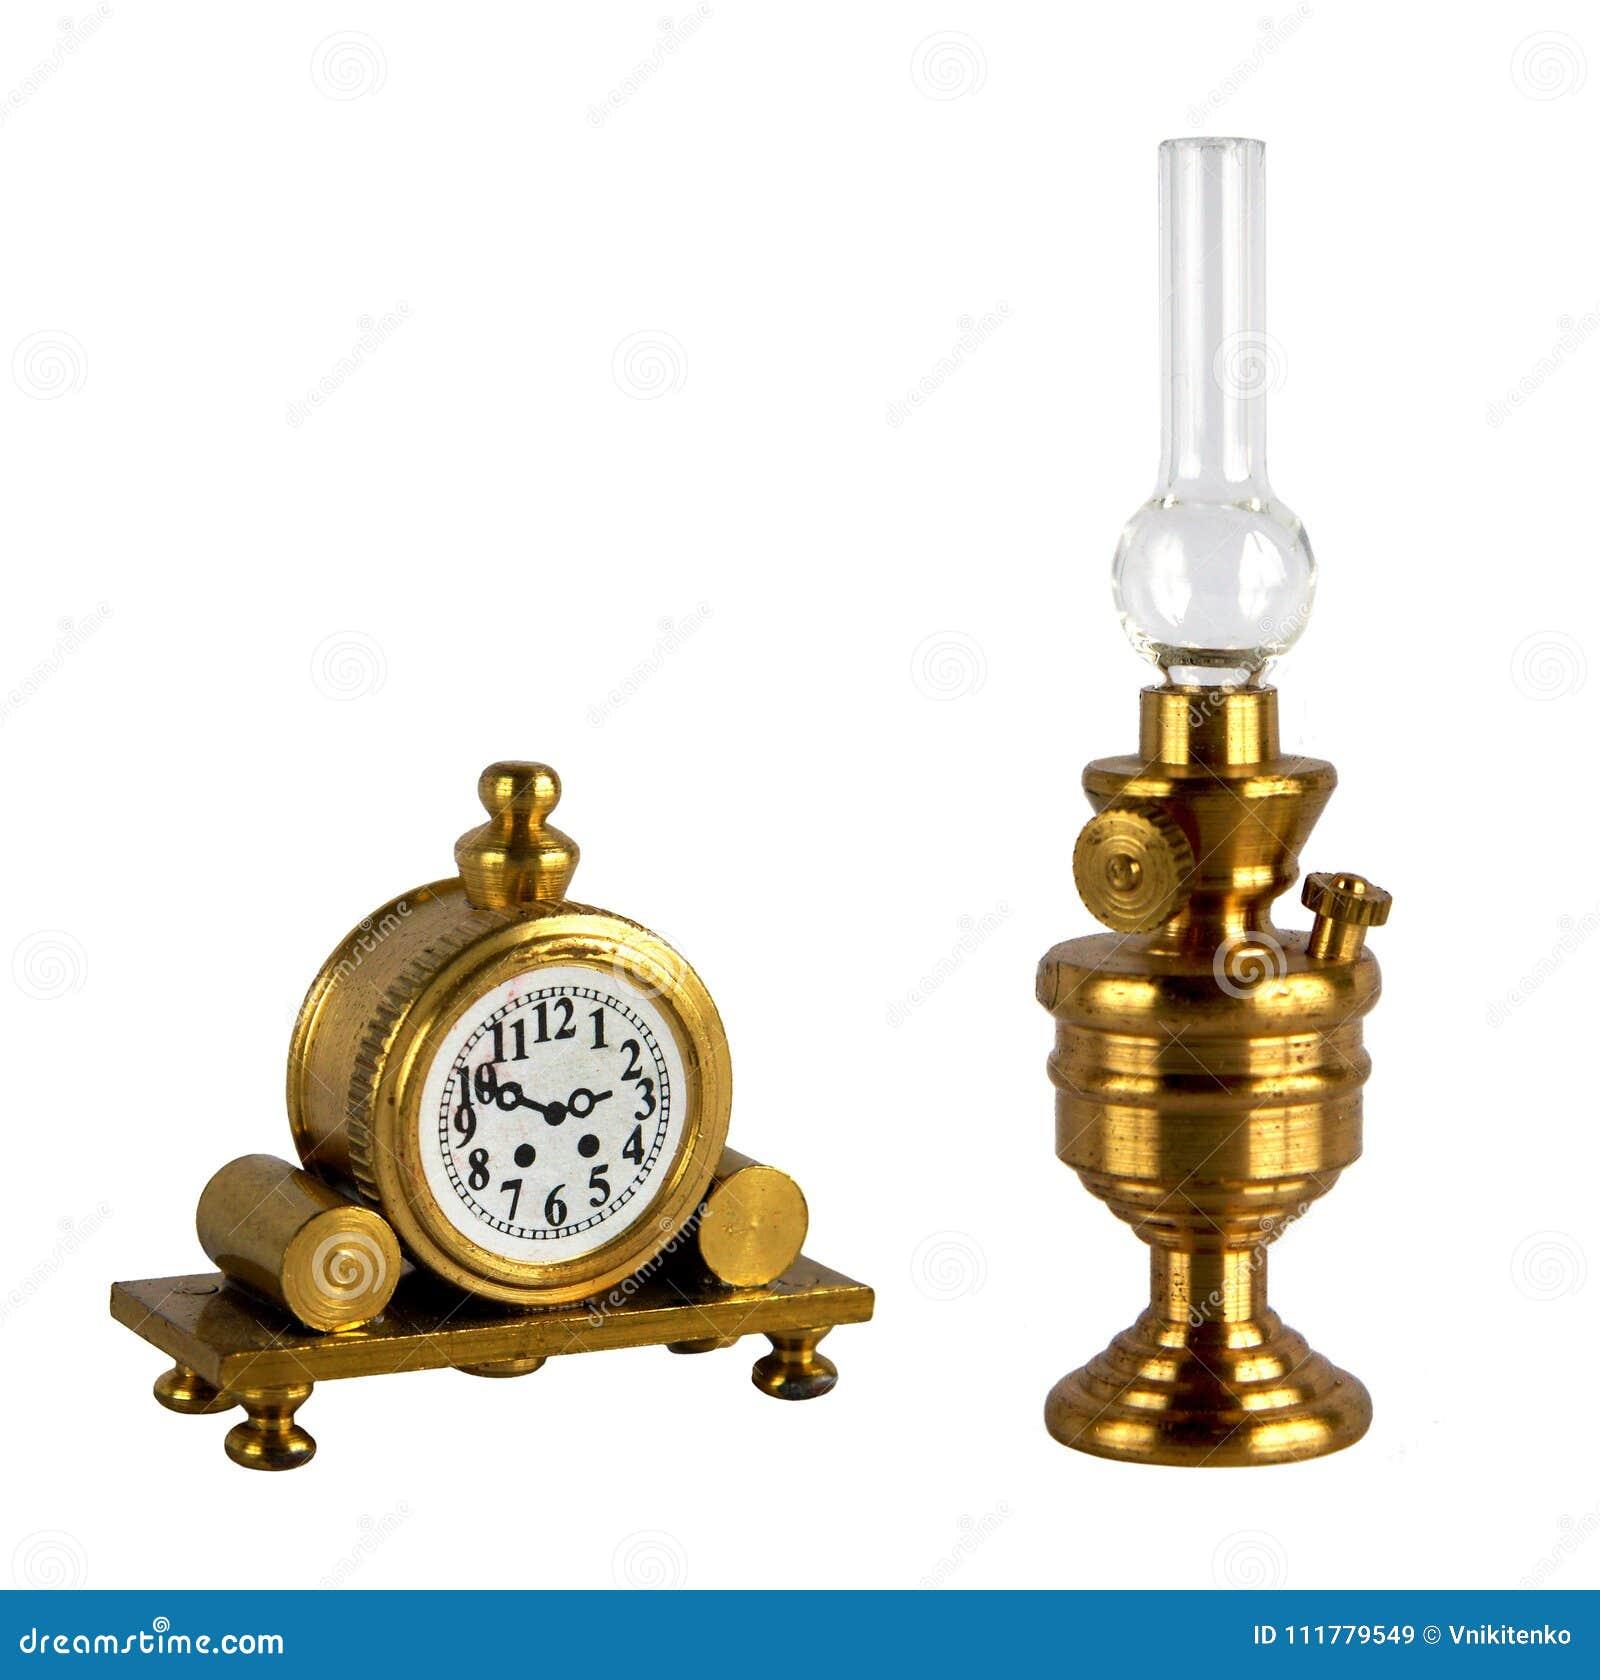 Vintage kerosene lamp and mantel clock